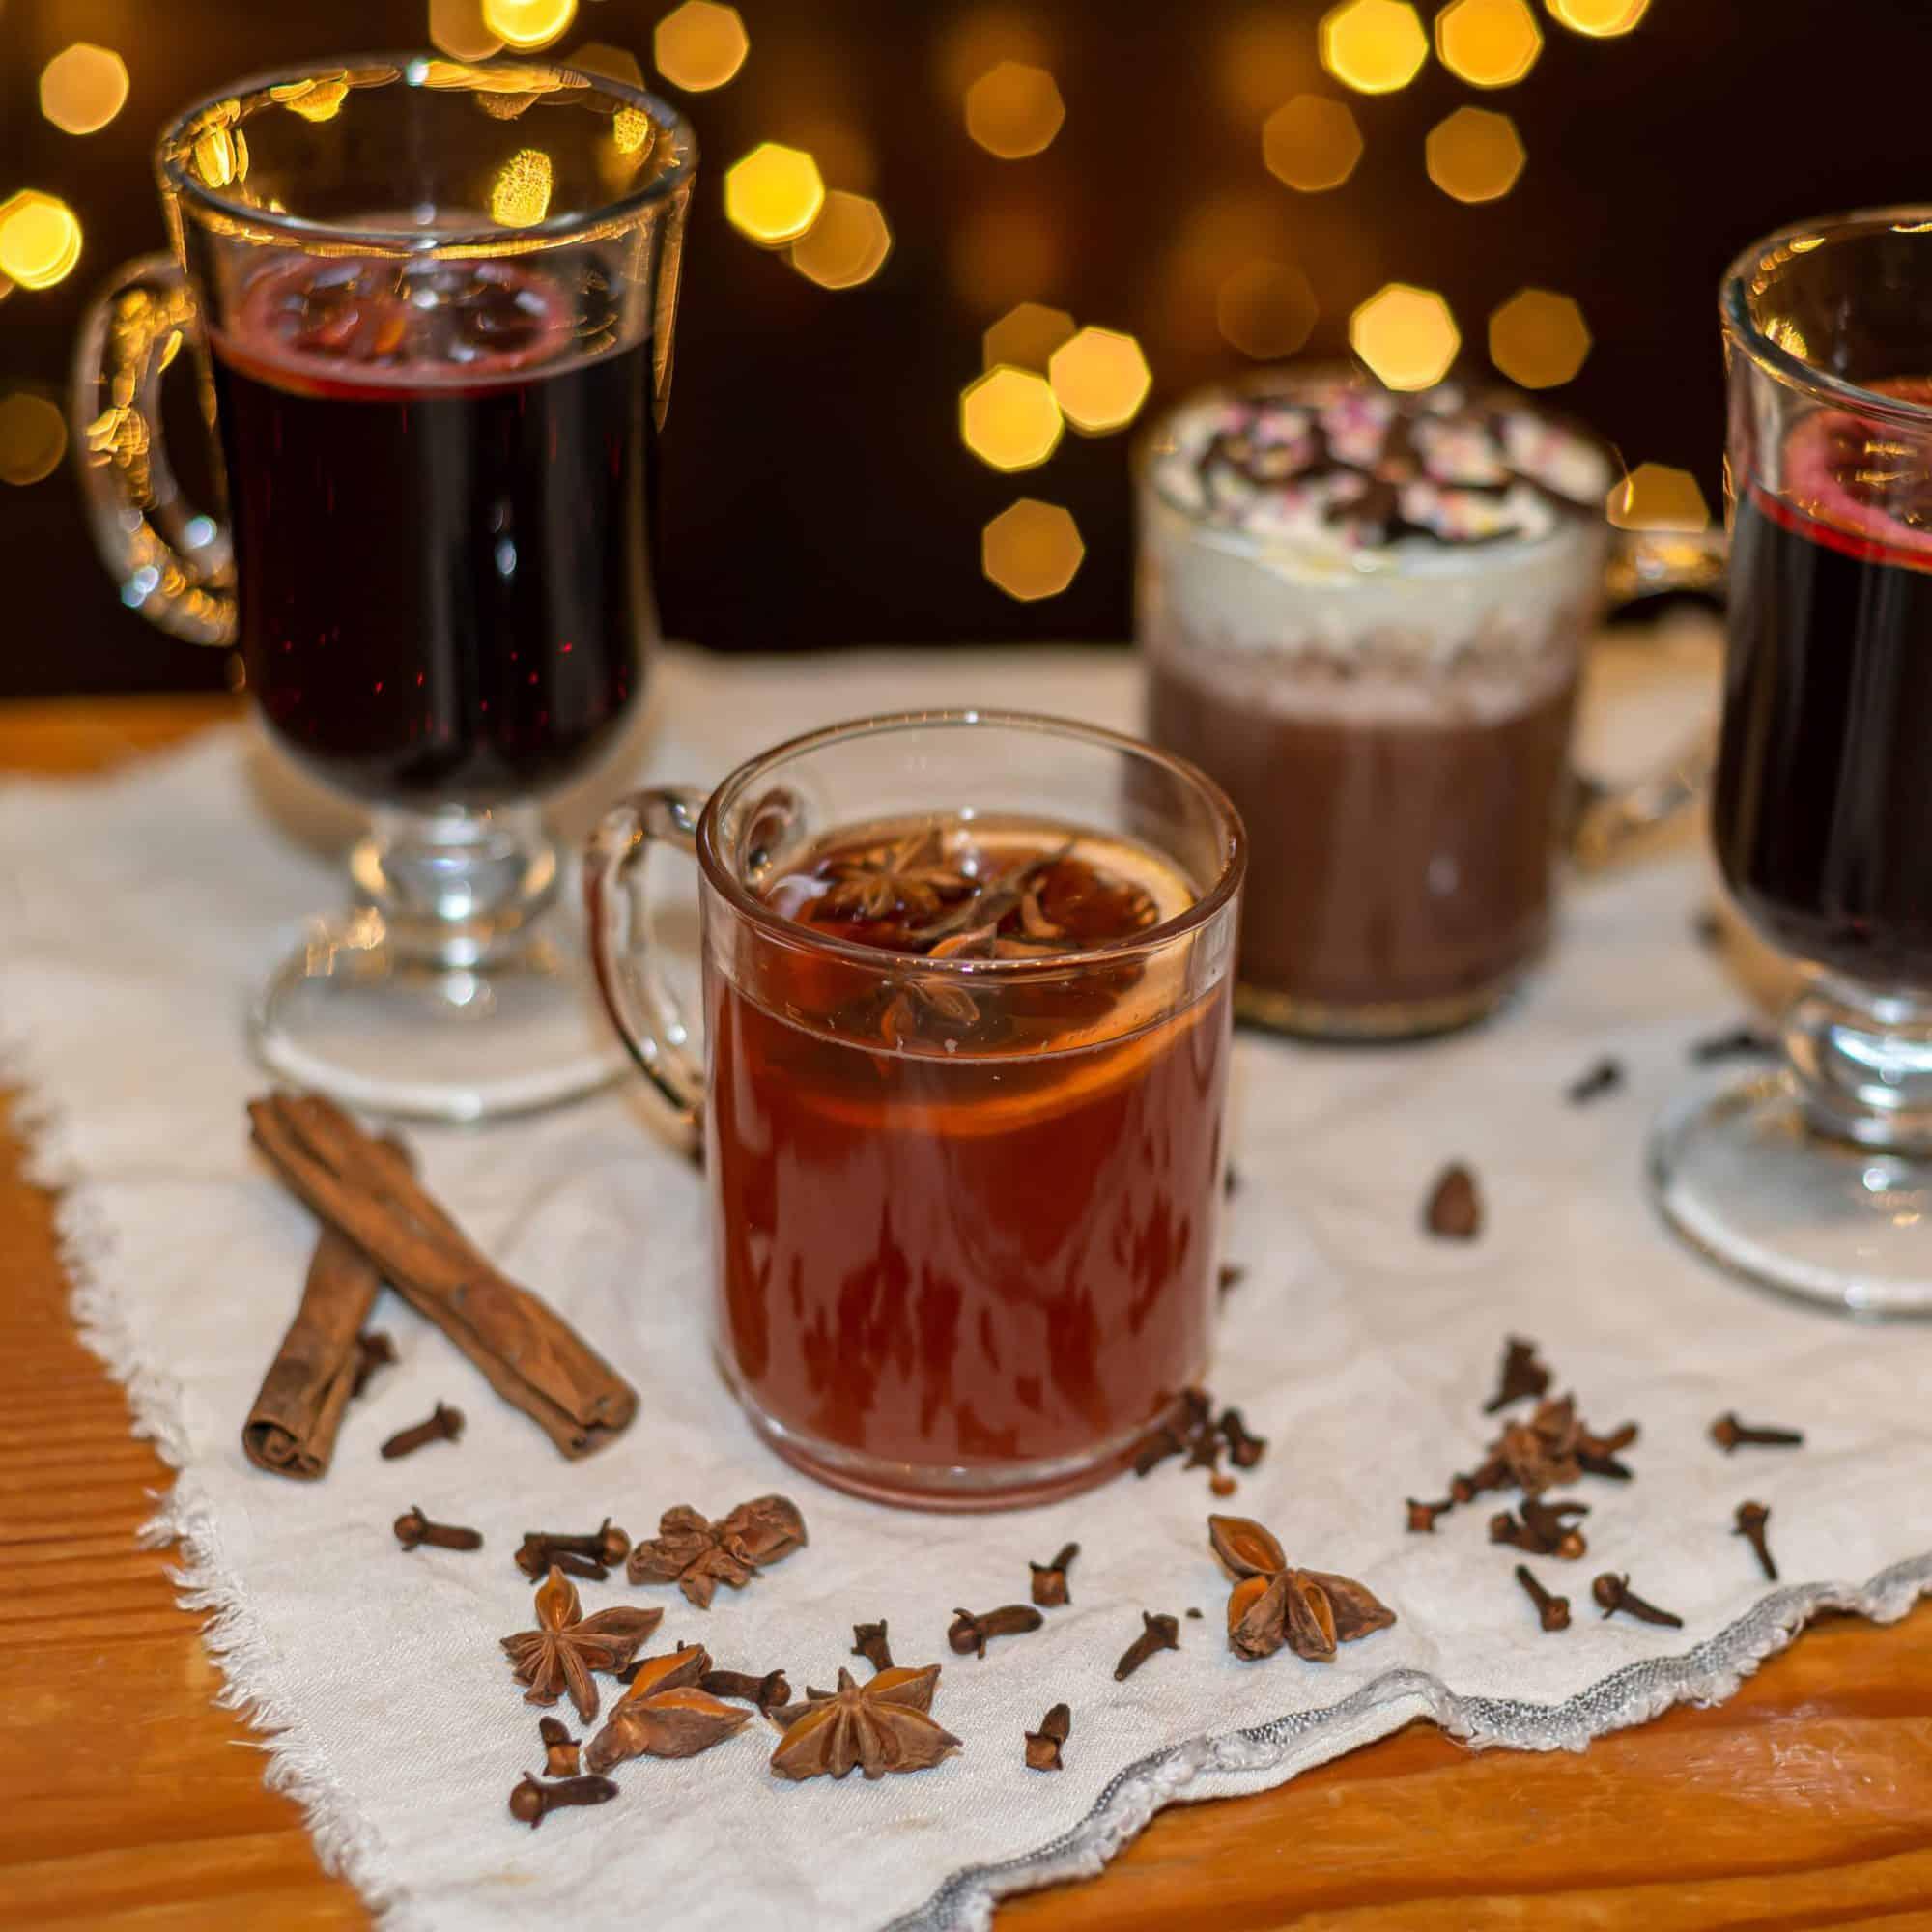 Tramshed festive drinks